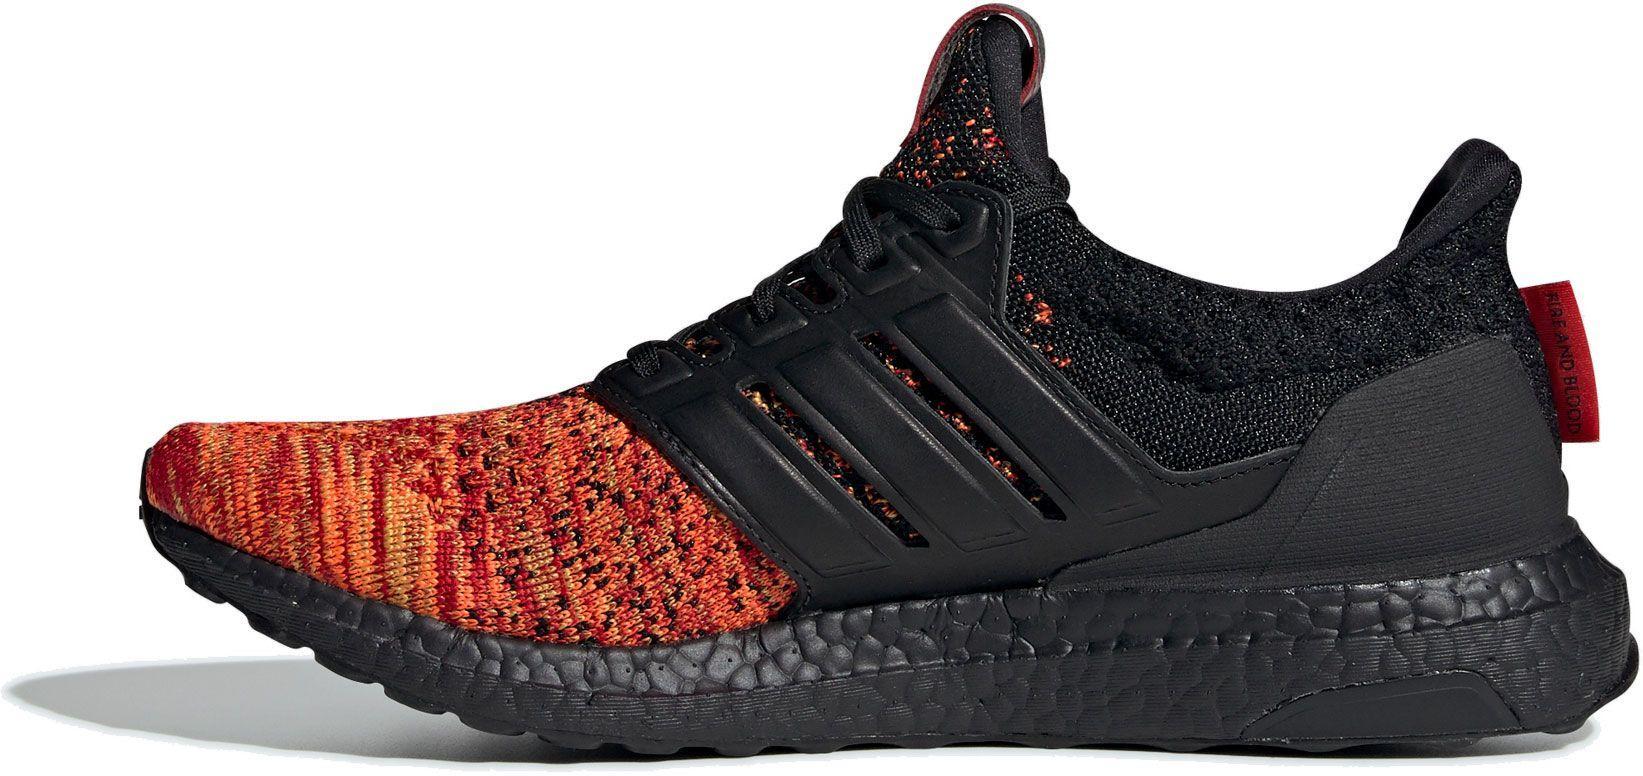 chaussure ultra boost adidas x game of thrones house targaryen